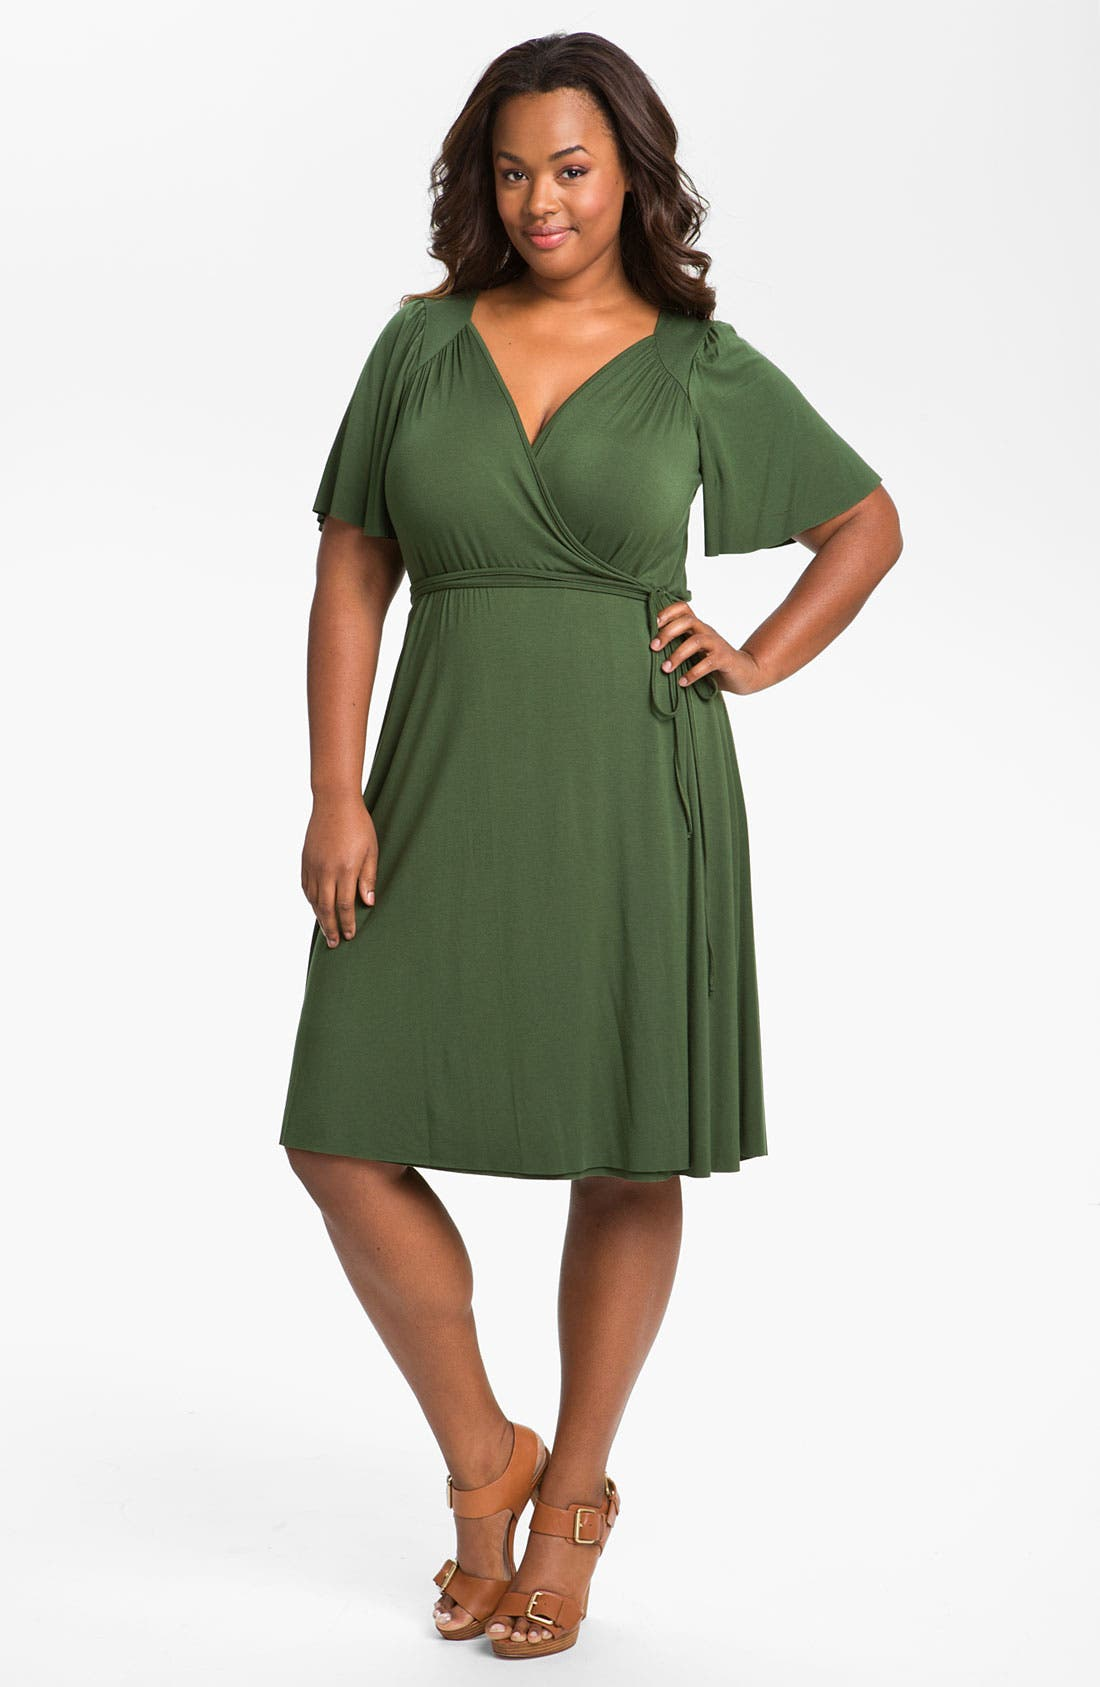 Alternate Image 1 Selected - Rachel Pally 'Finn' Wrap Dress (Plus)